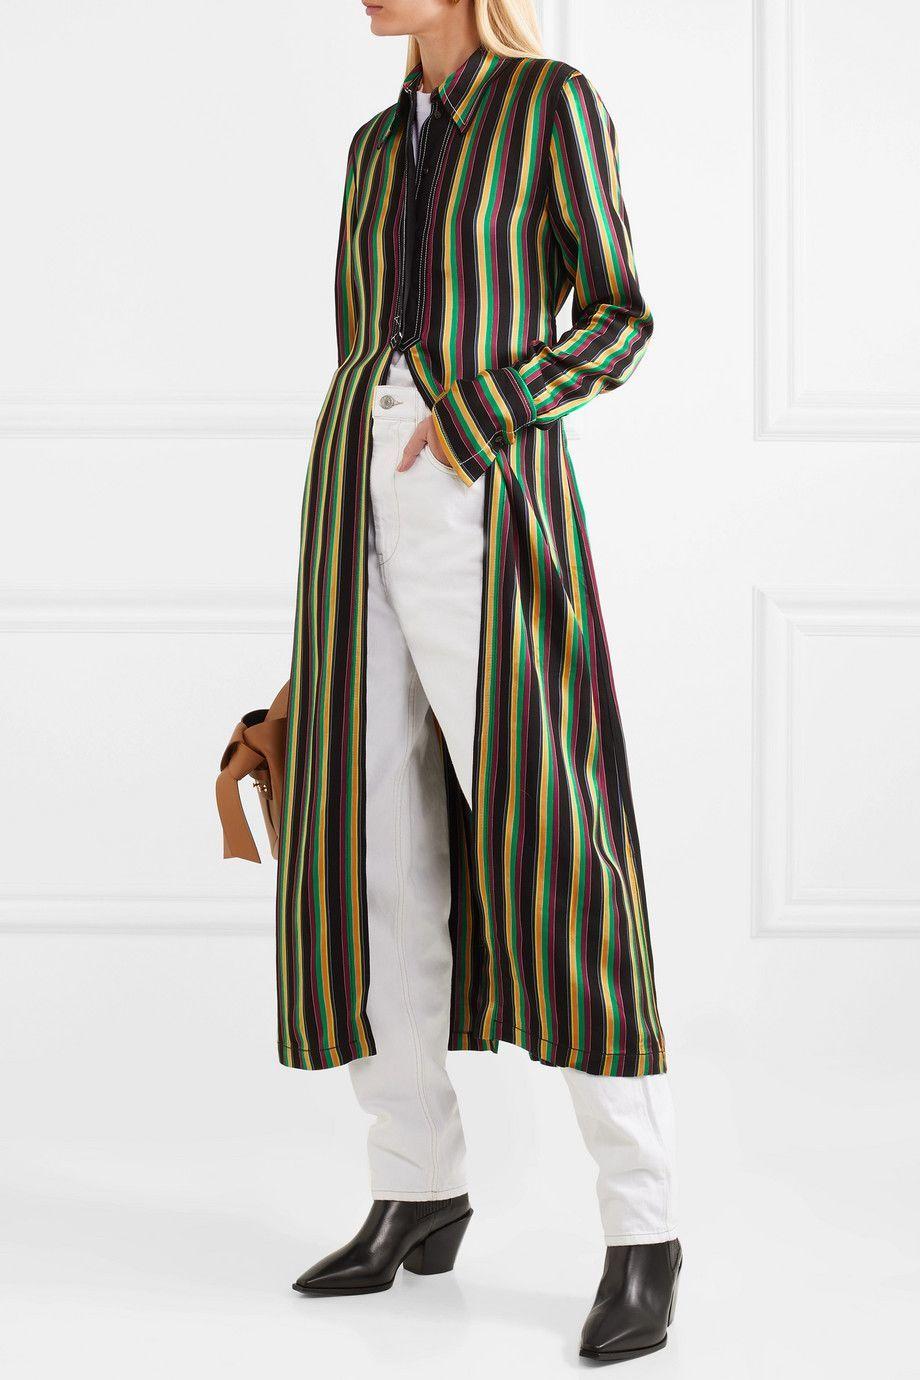 Semakin Trendi, Ini Model Tunik Modern Terbaru 2019